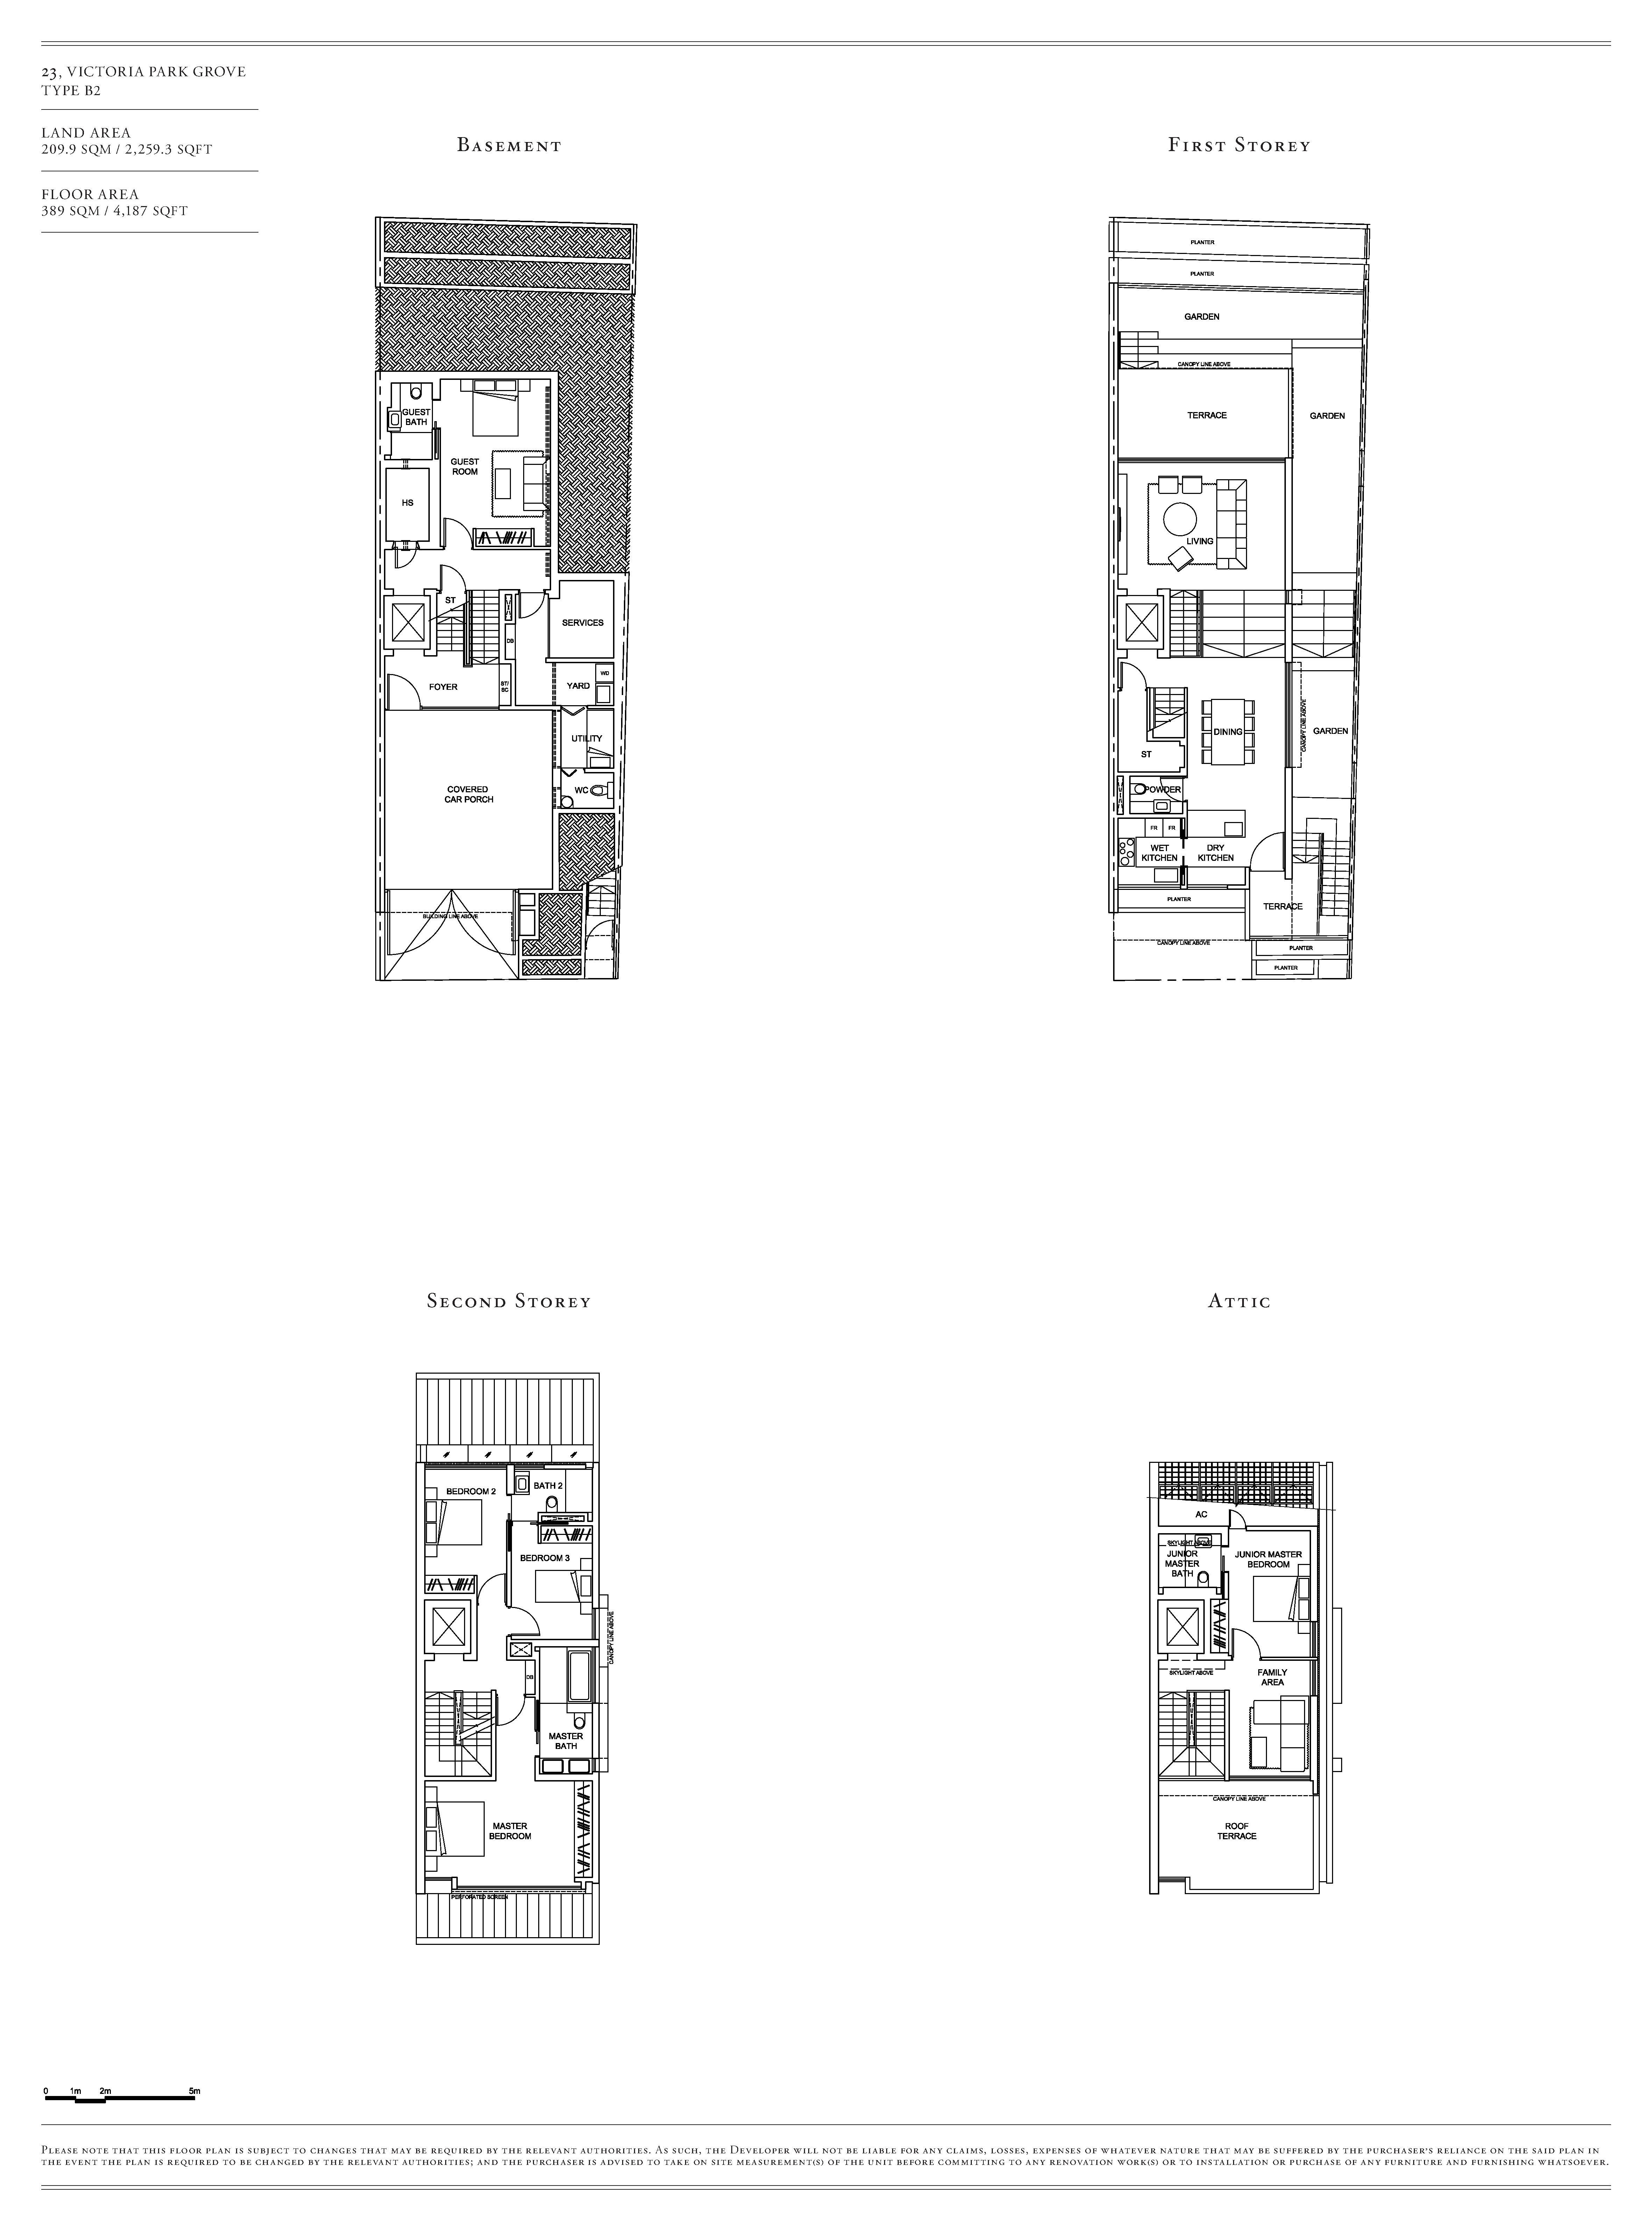 Victoria Park Villas House 23 Type B2 Floor Plans